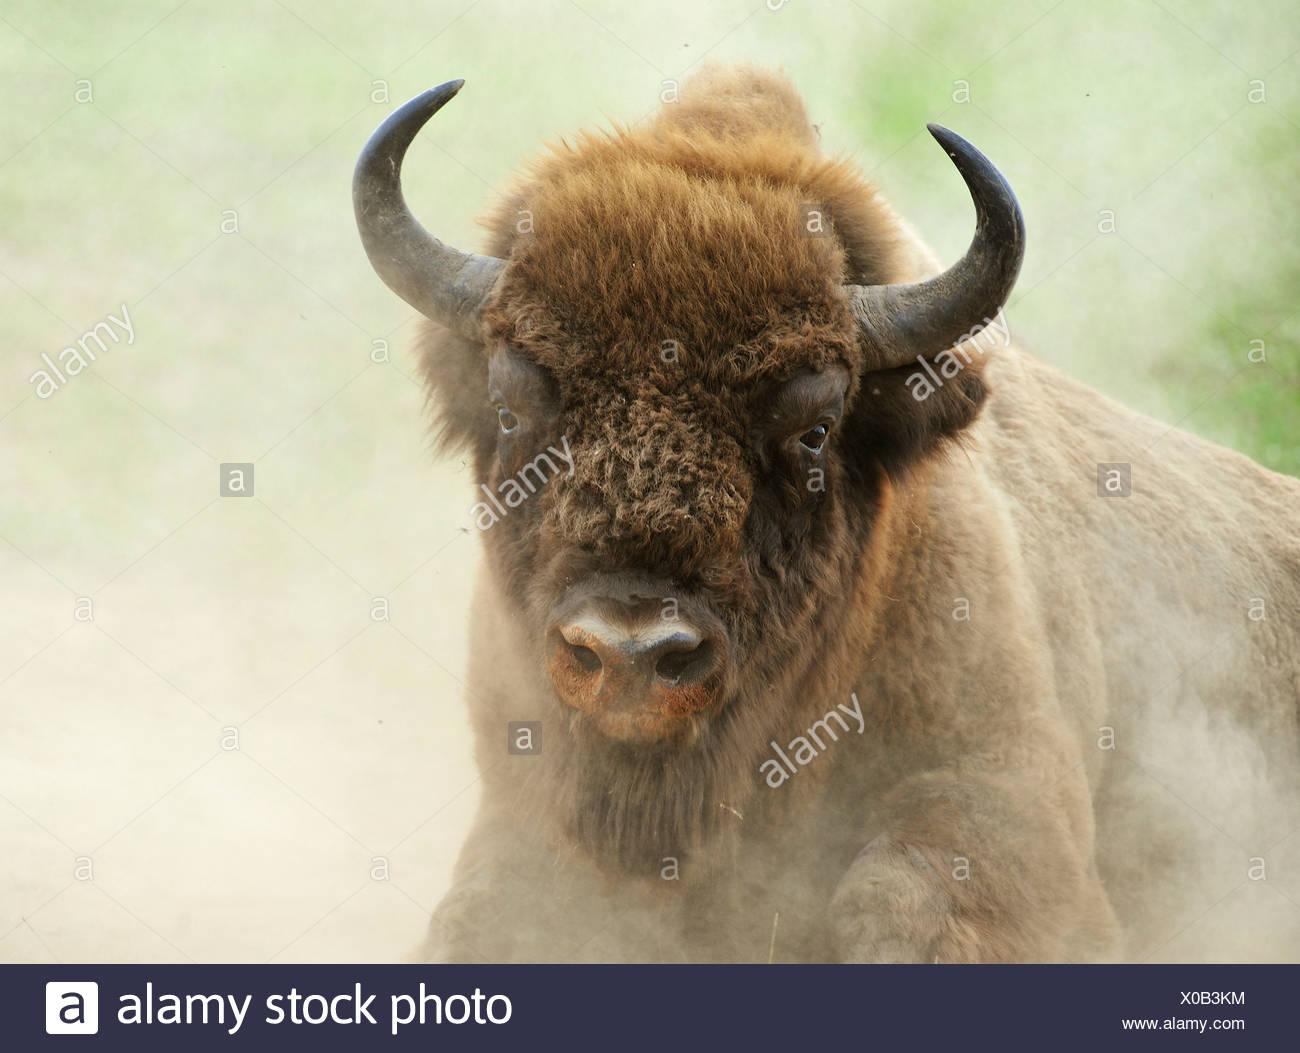 European Bison (Bison bonasus) in the whirling dust, Wisentgehege Hardehausen wildlife park - Stock Image